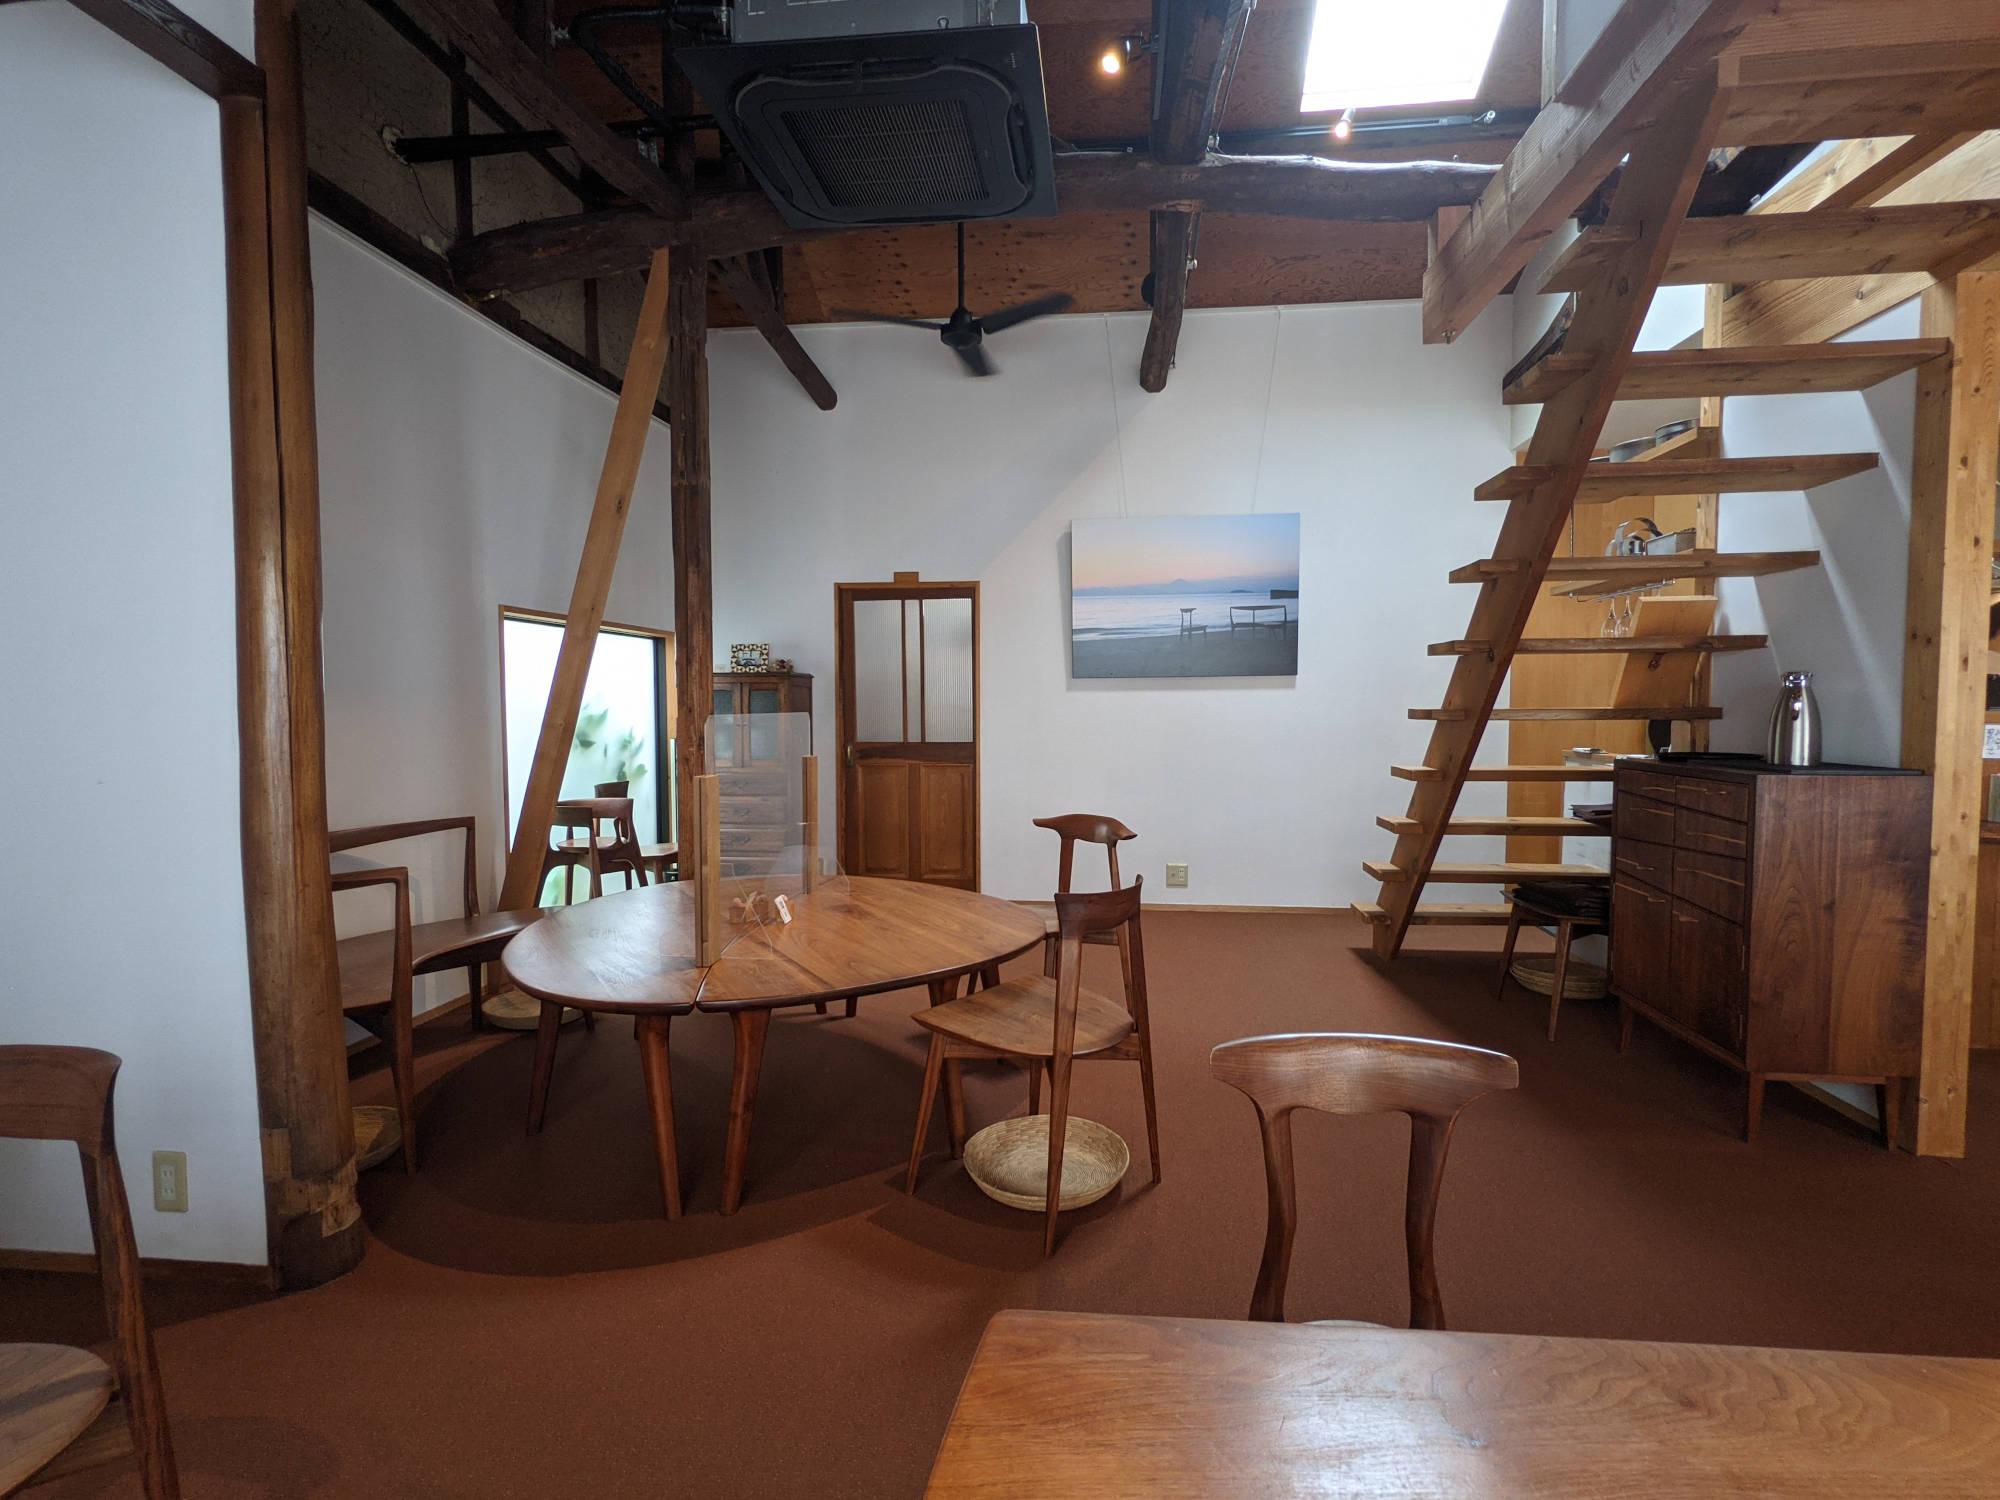 「cafe recette 鎌倉」の店内